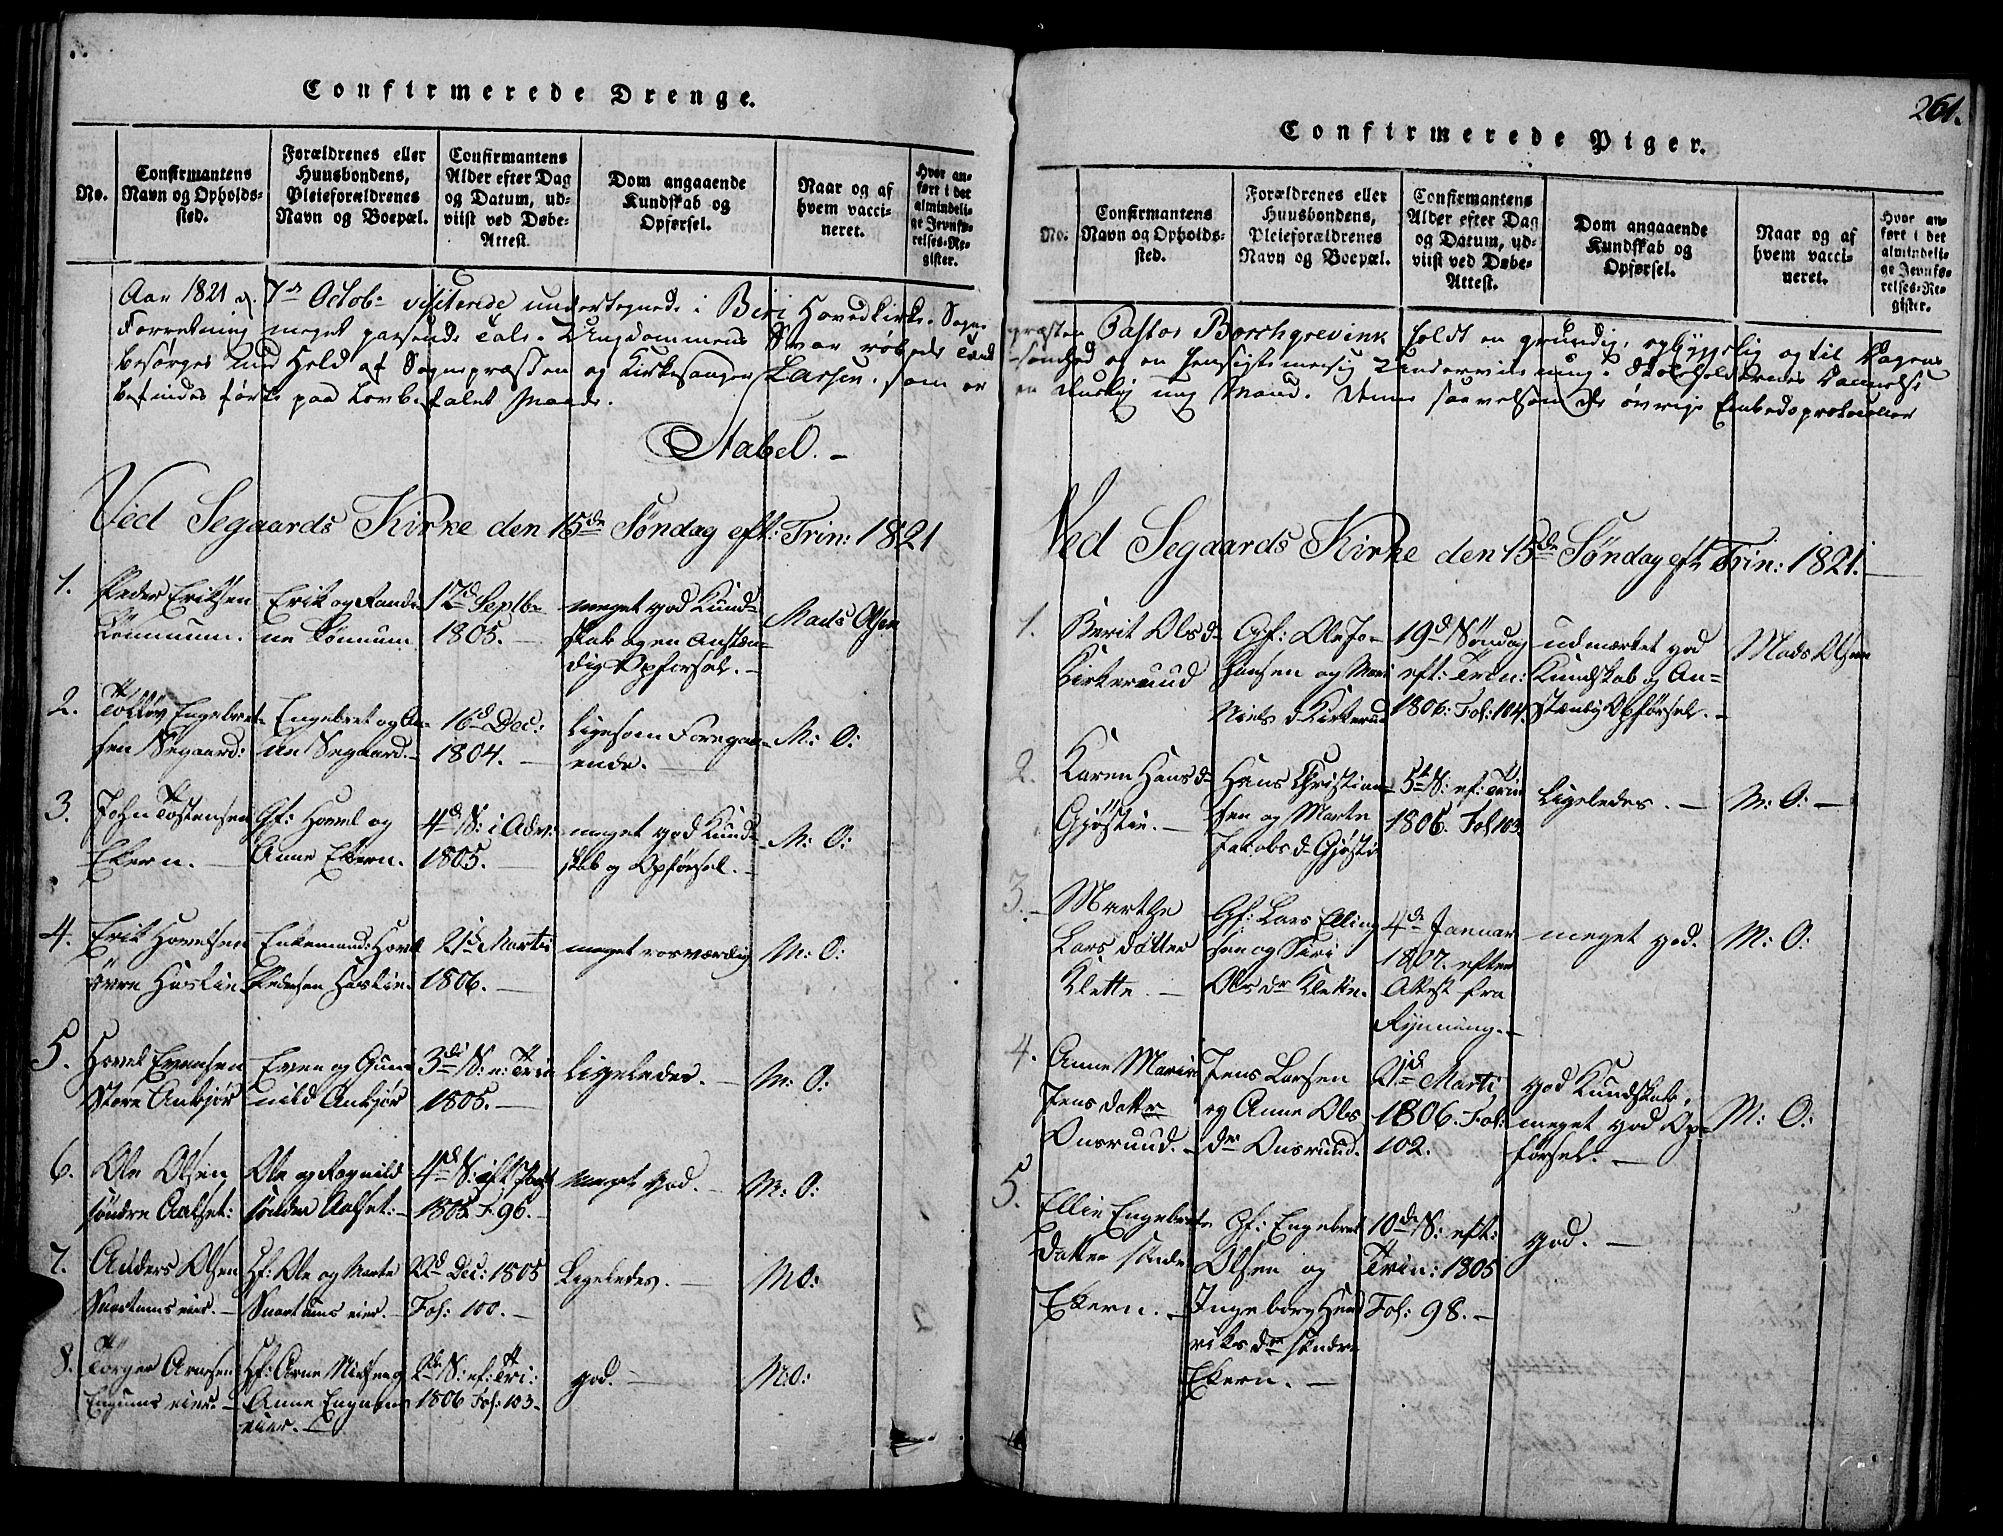 SAH, Biri prestekontor, Ministerialbok nr. 3, 1814-1828, s. 261